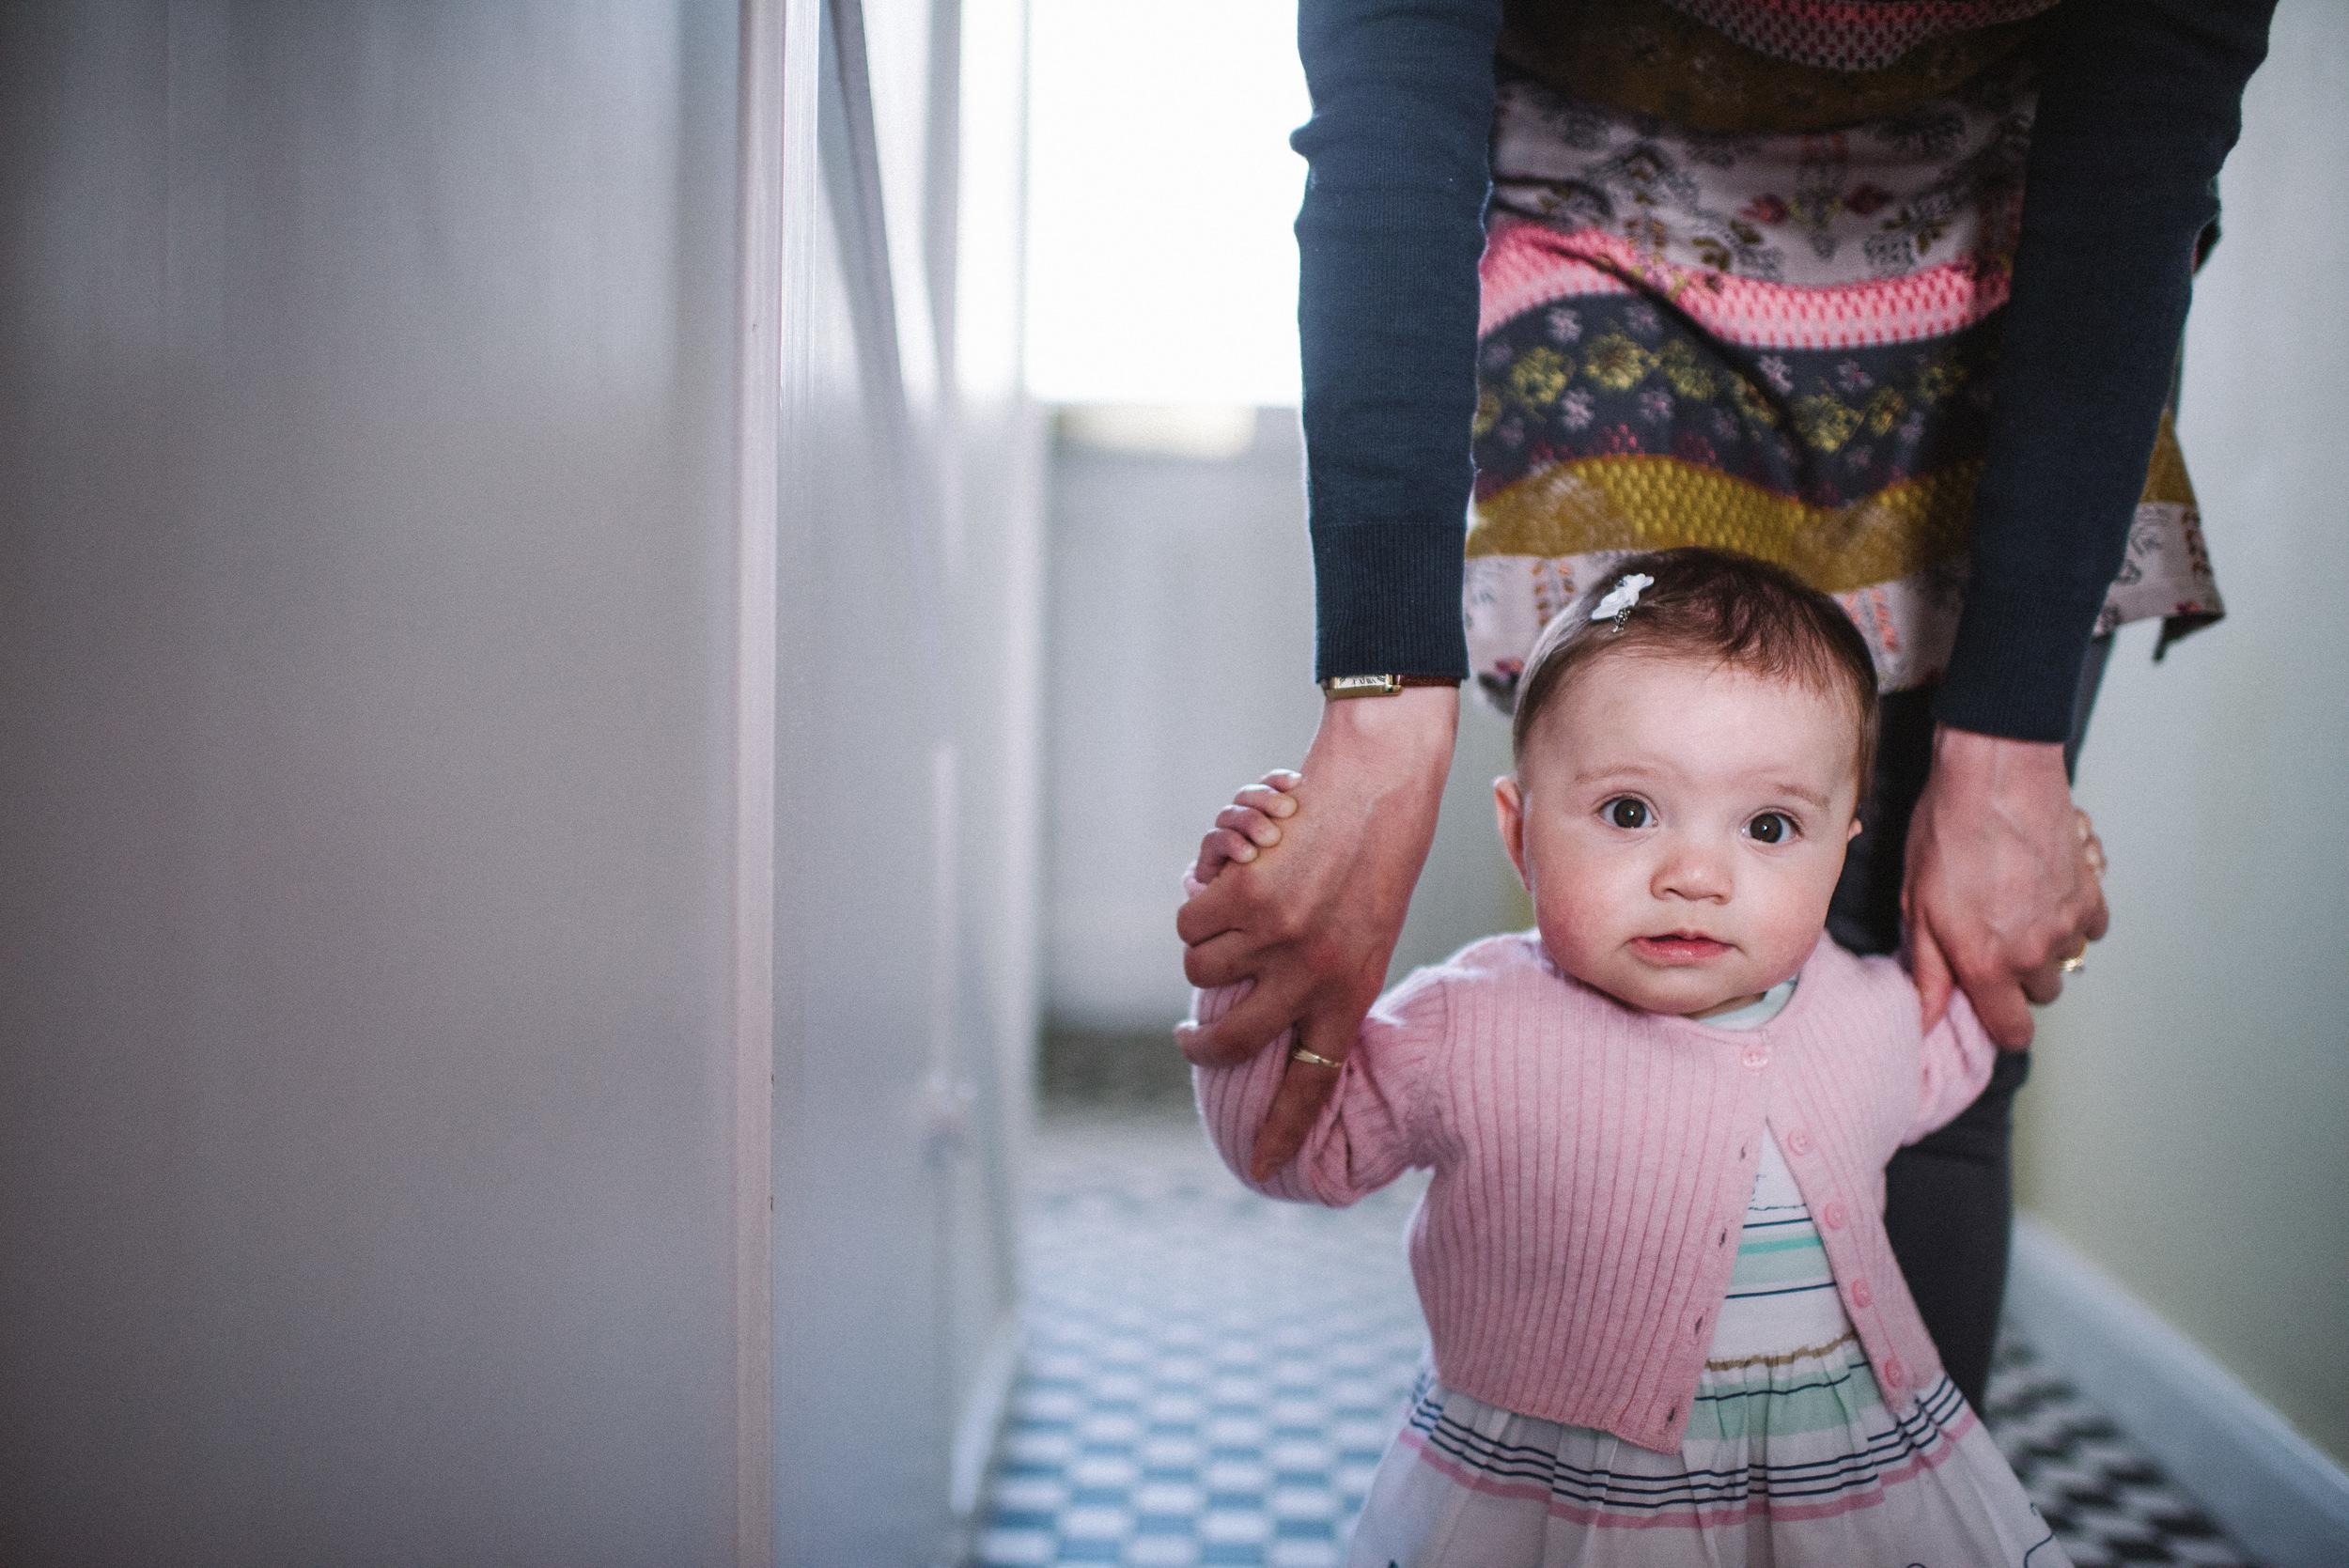 0042-ALTERNATIVE-WEDDING-PHOTOGRAPHER-GLASGOW-FAMILY-PHOTOGRAPHER-KIDS-PORTRAITS-BABY-PORTRAITS-GLASGOW.JPG